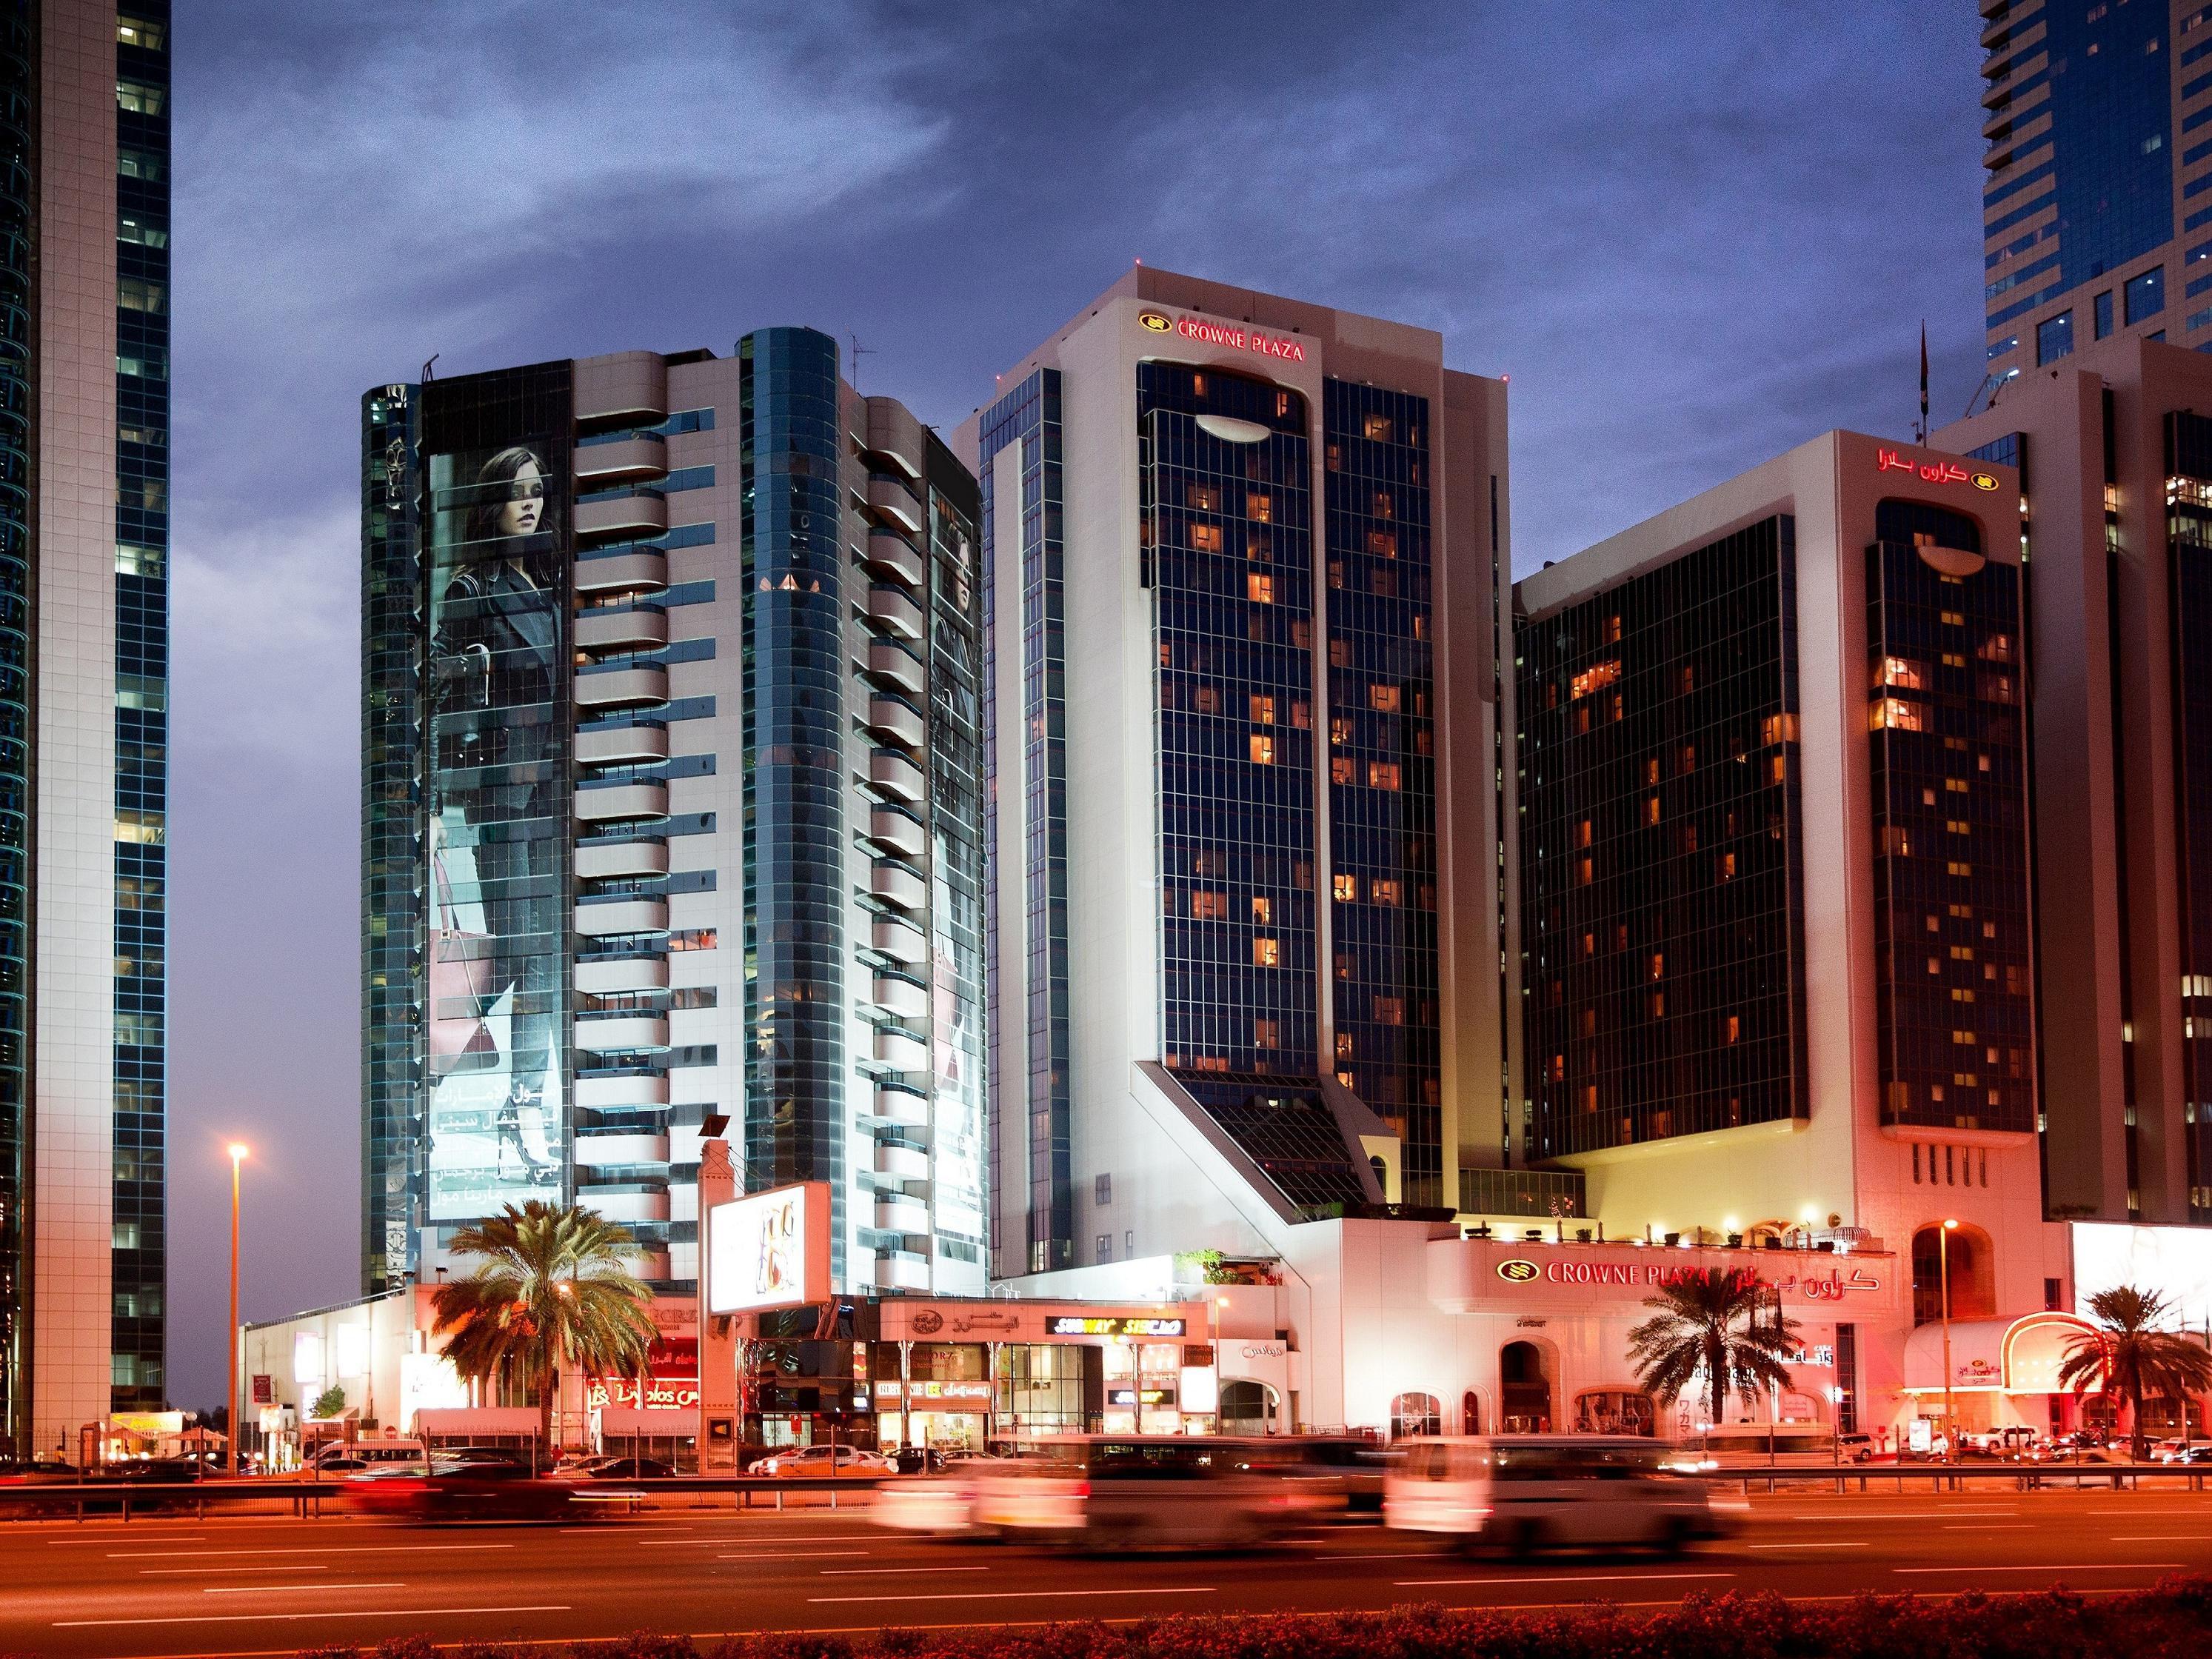 Chelsea plaza hotel dubai dubai book cheap amp discount hotels - Welcome Photos